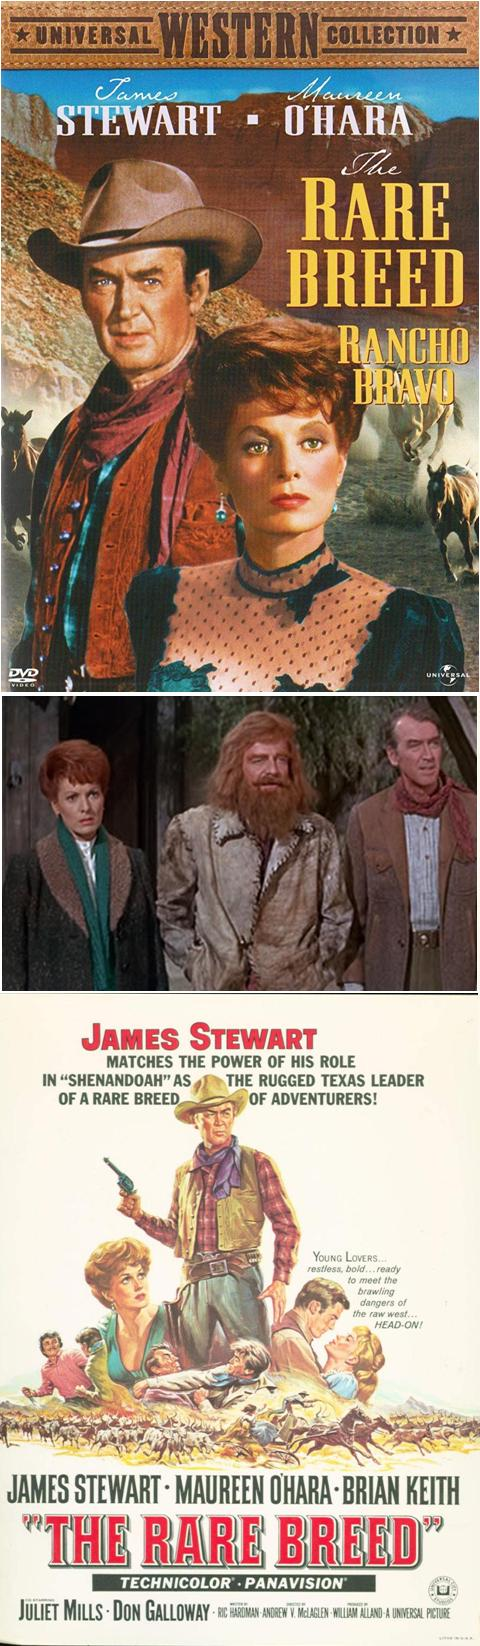 Rancho Bravo - The Rare Breed - Andrew V McLaglen - 1966 5-agai11